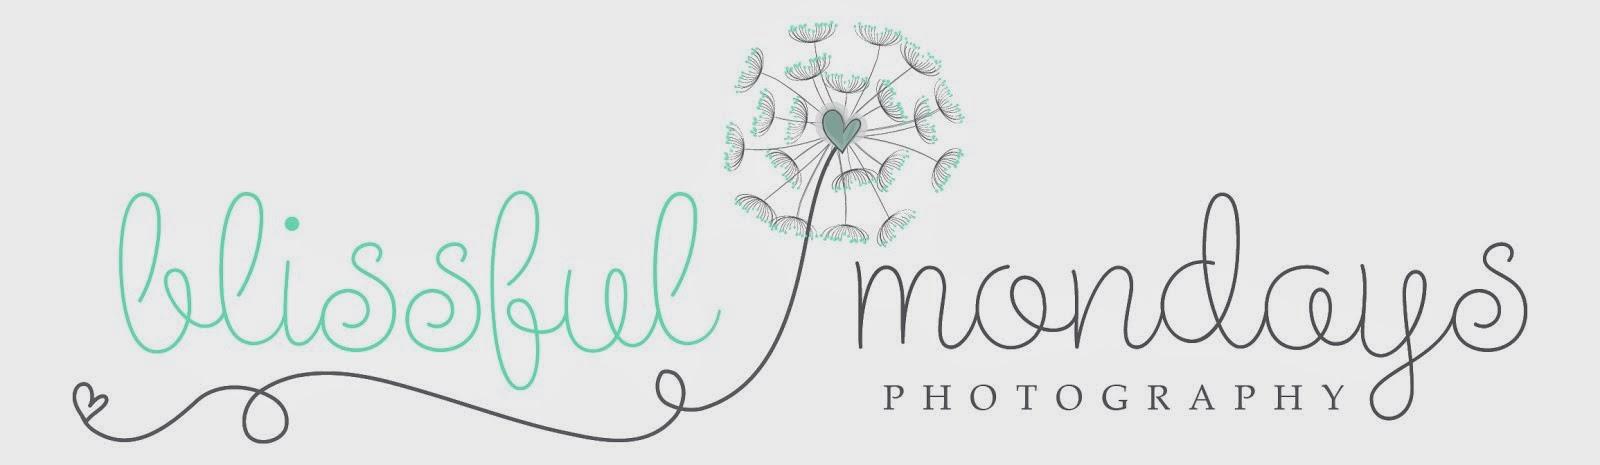 Blissful Mondays Photography